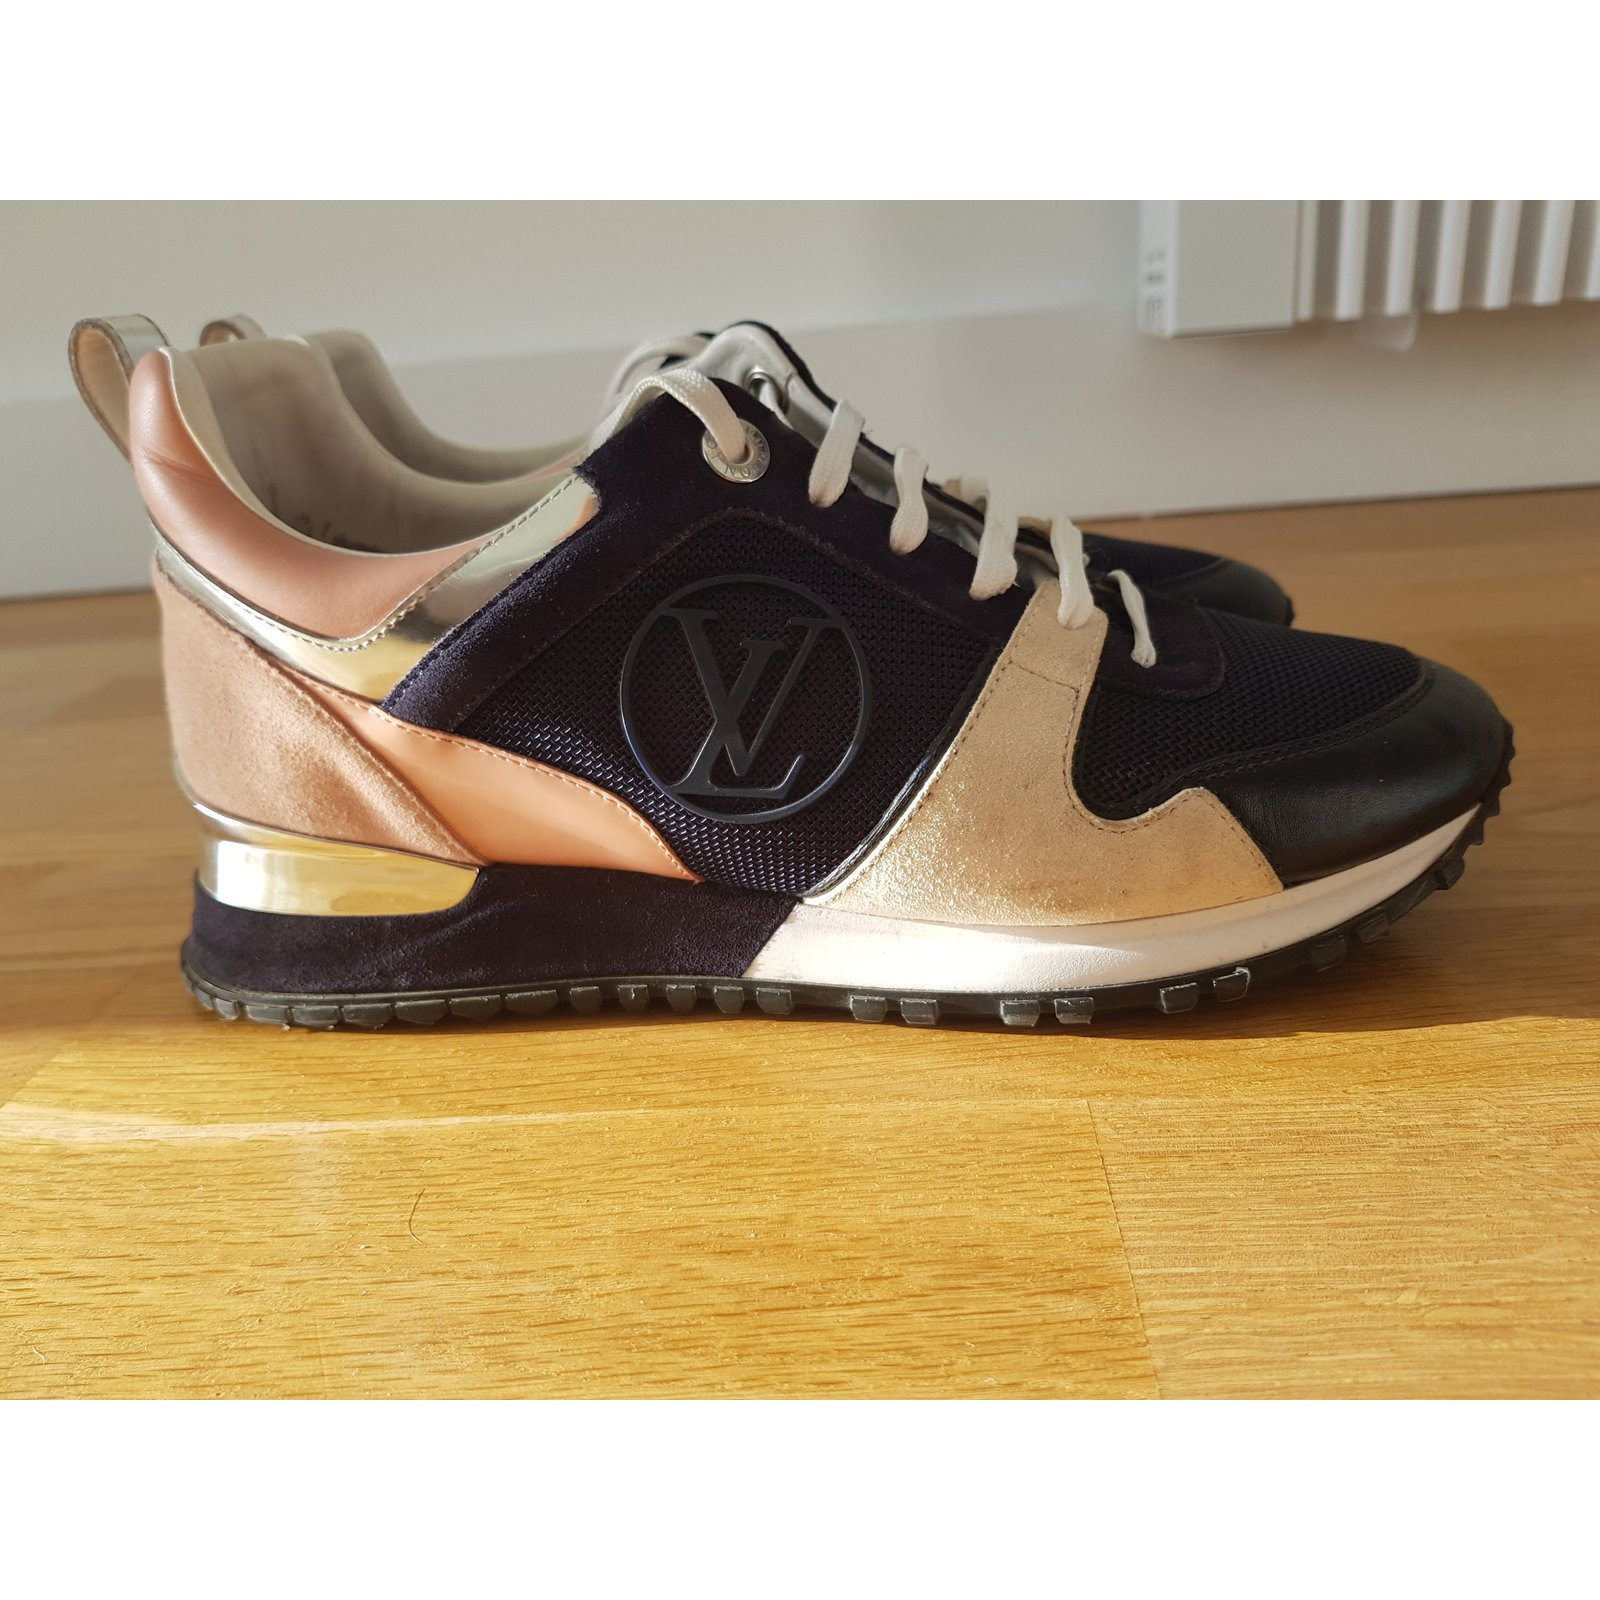 ff5da52498b Louis Vuitton Runaway trainers Sneakers Suede